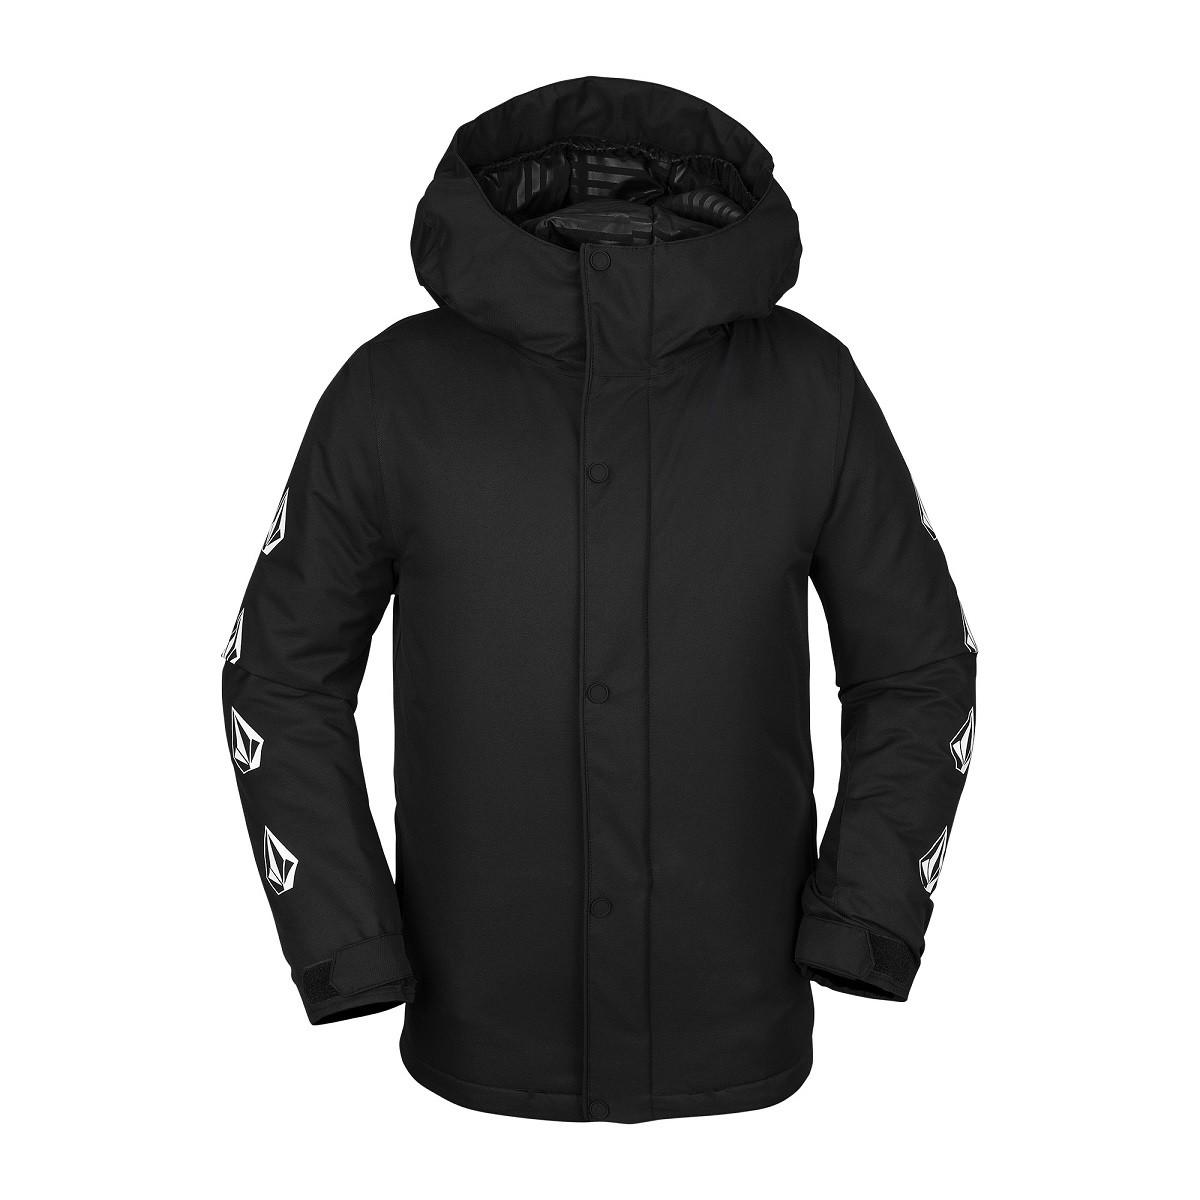 Volcom B Ripley Ins Jacket 2020